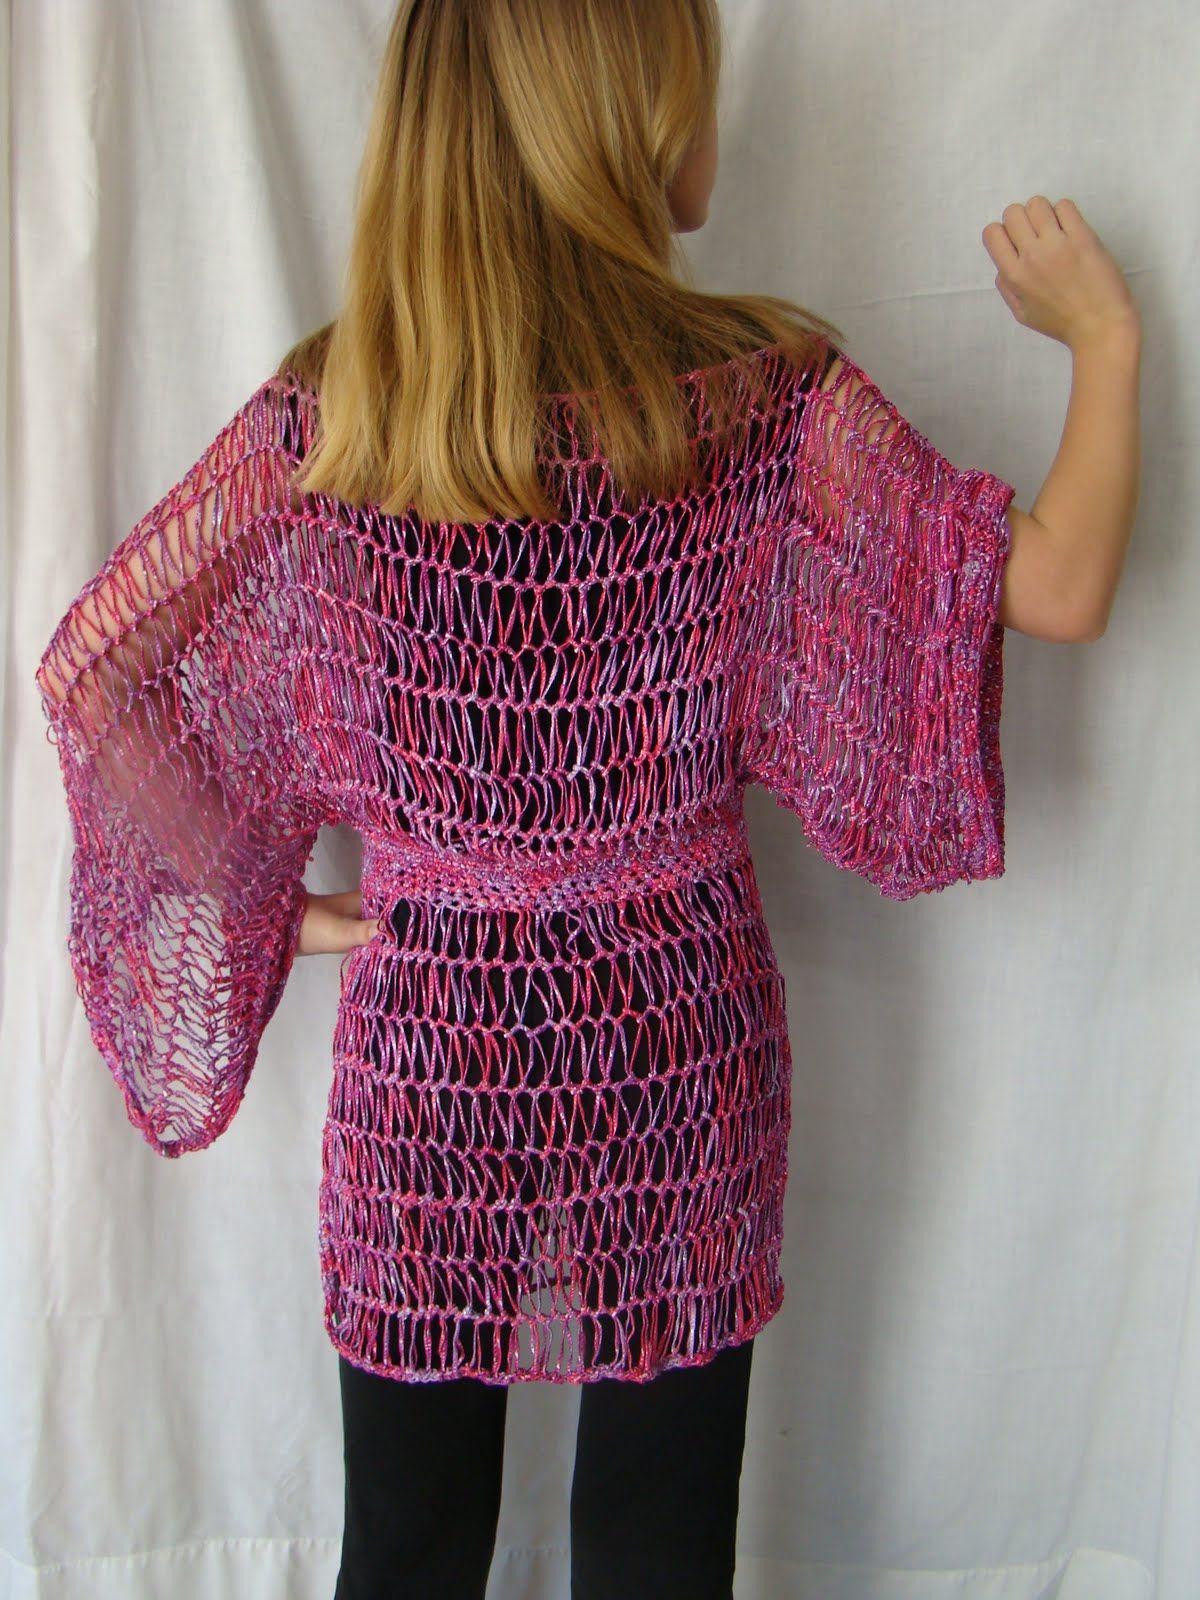 Fine lace crochet tunic google search crochet pinterest patterns bankloansurffo Image collections